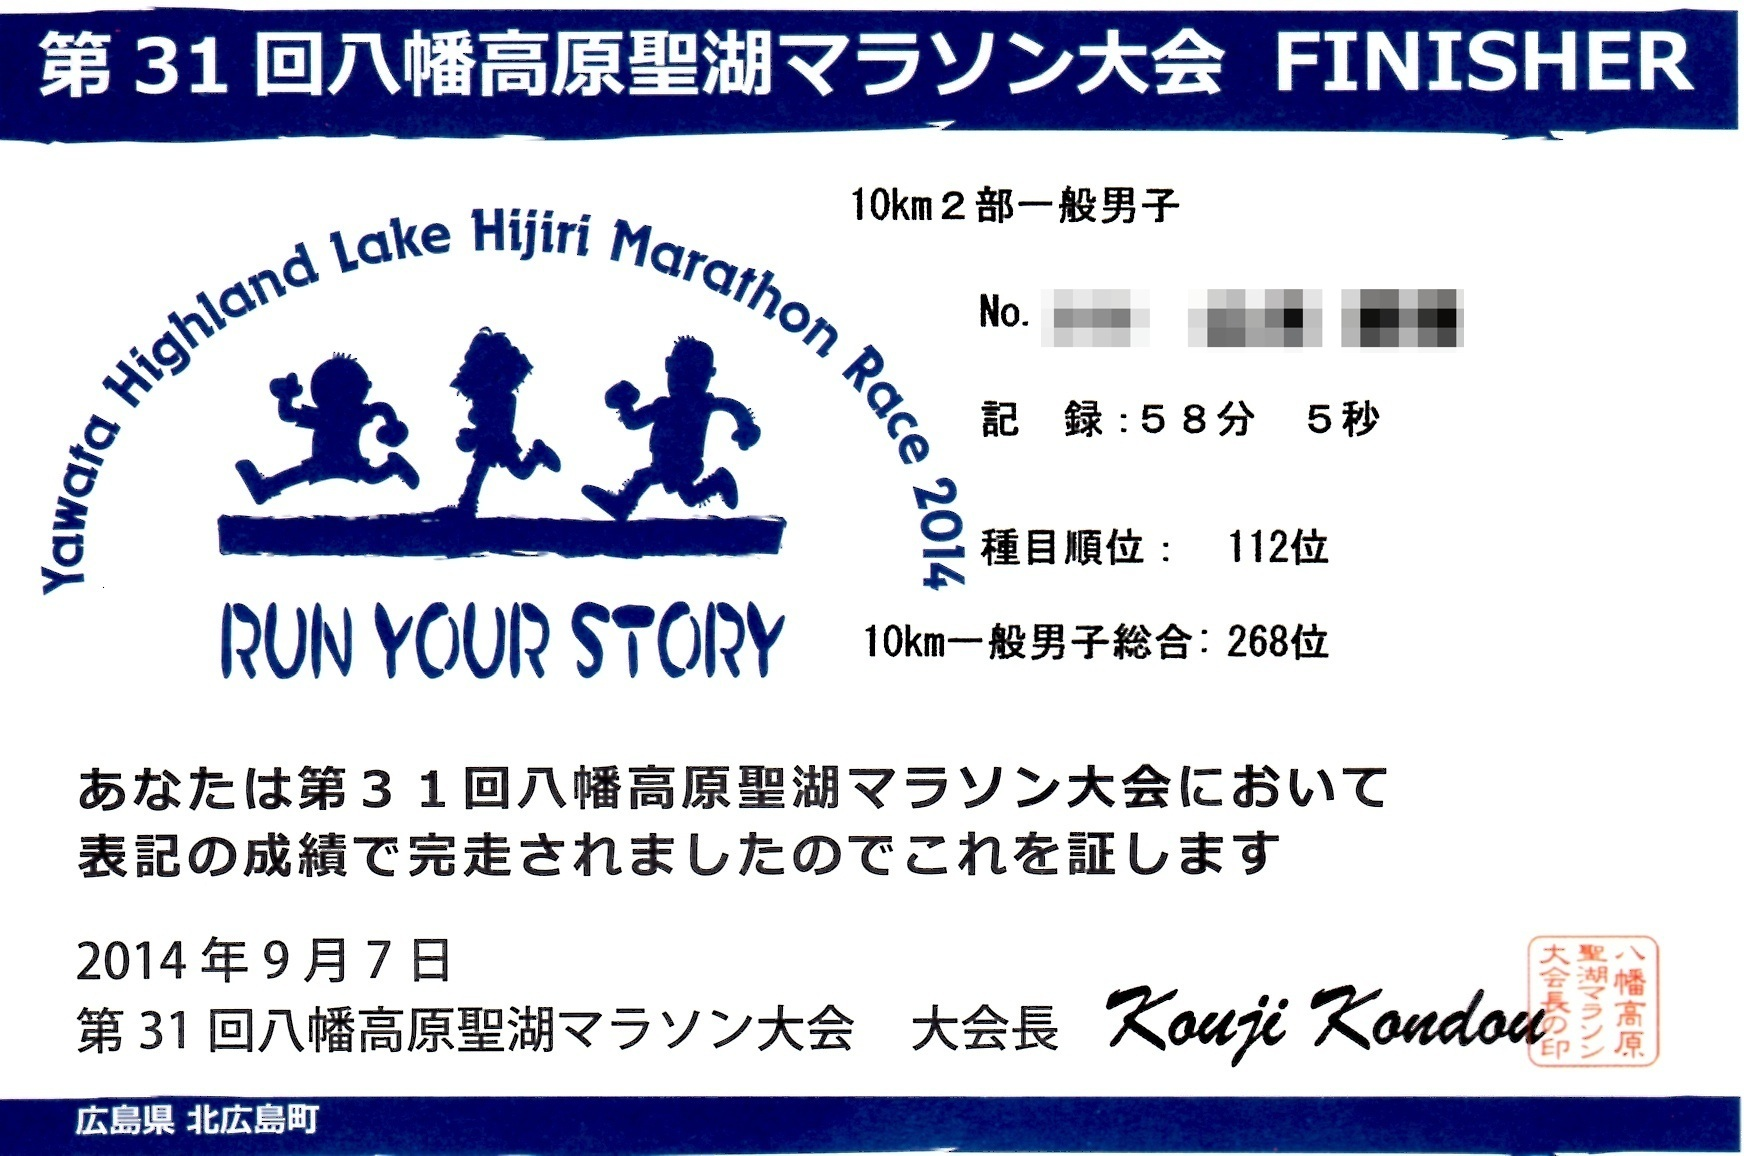 第31回八幡高原聖湖マラソン大会記録証